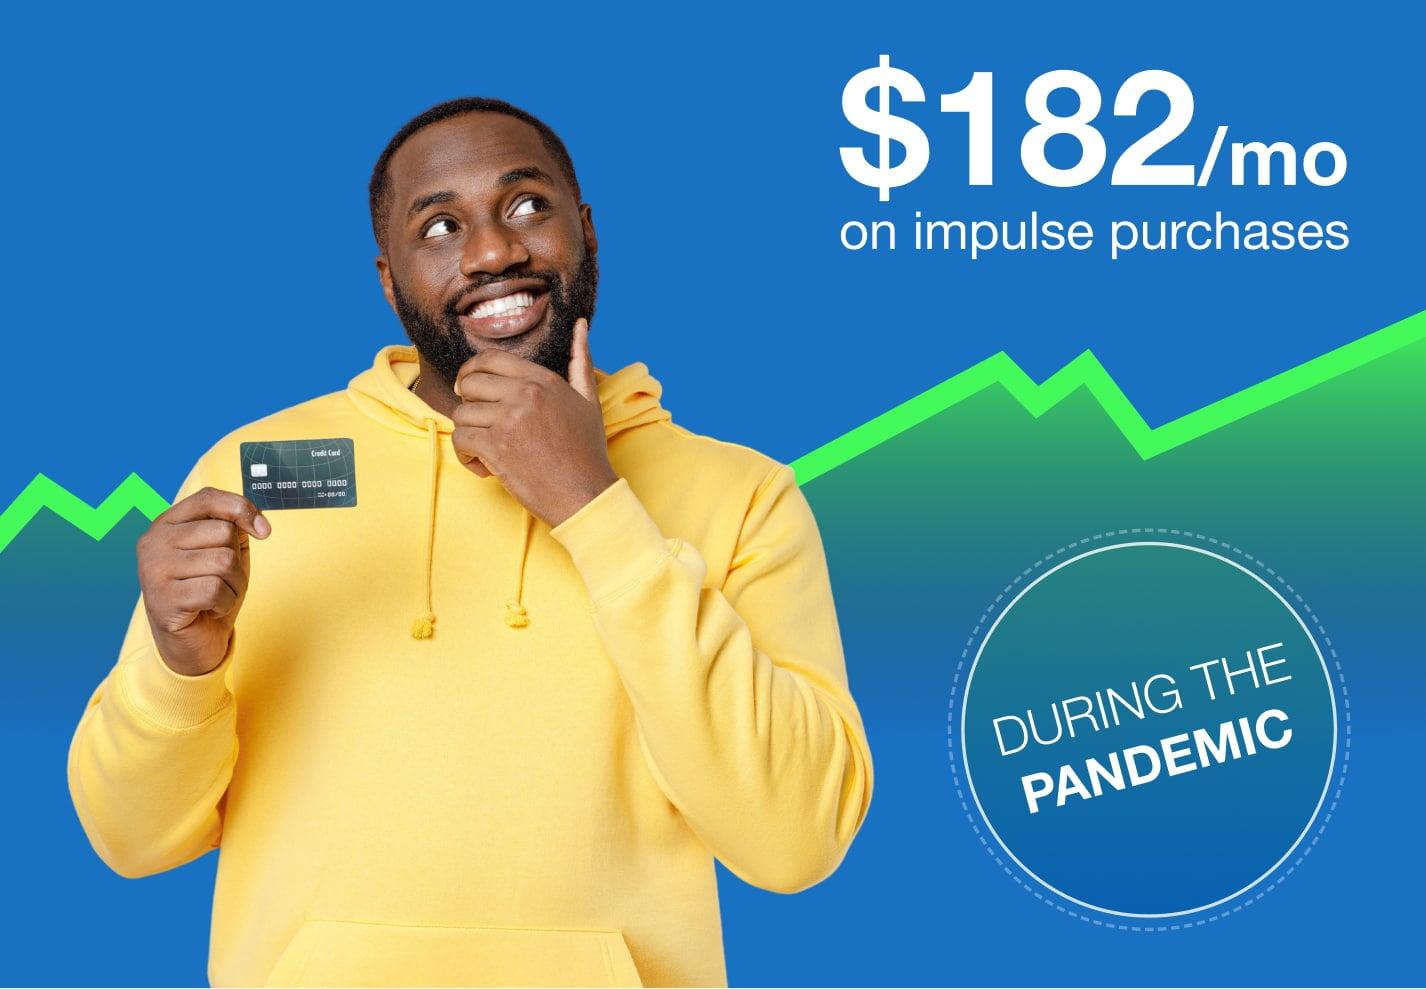 impulse spending's during the pandemic